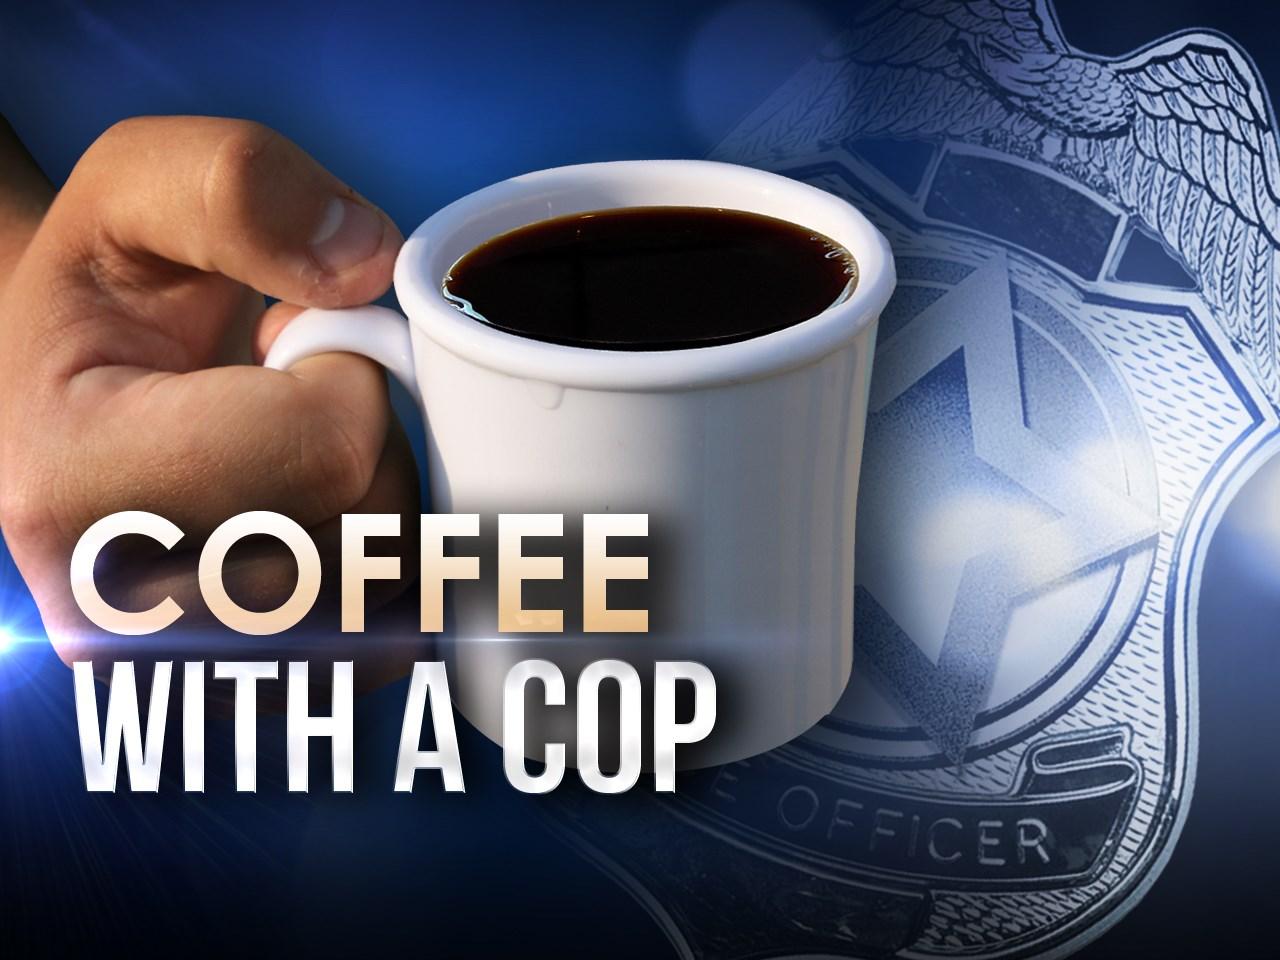 10-3-18 coffee with cop_1538581197940.jpg.jpg